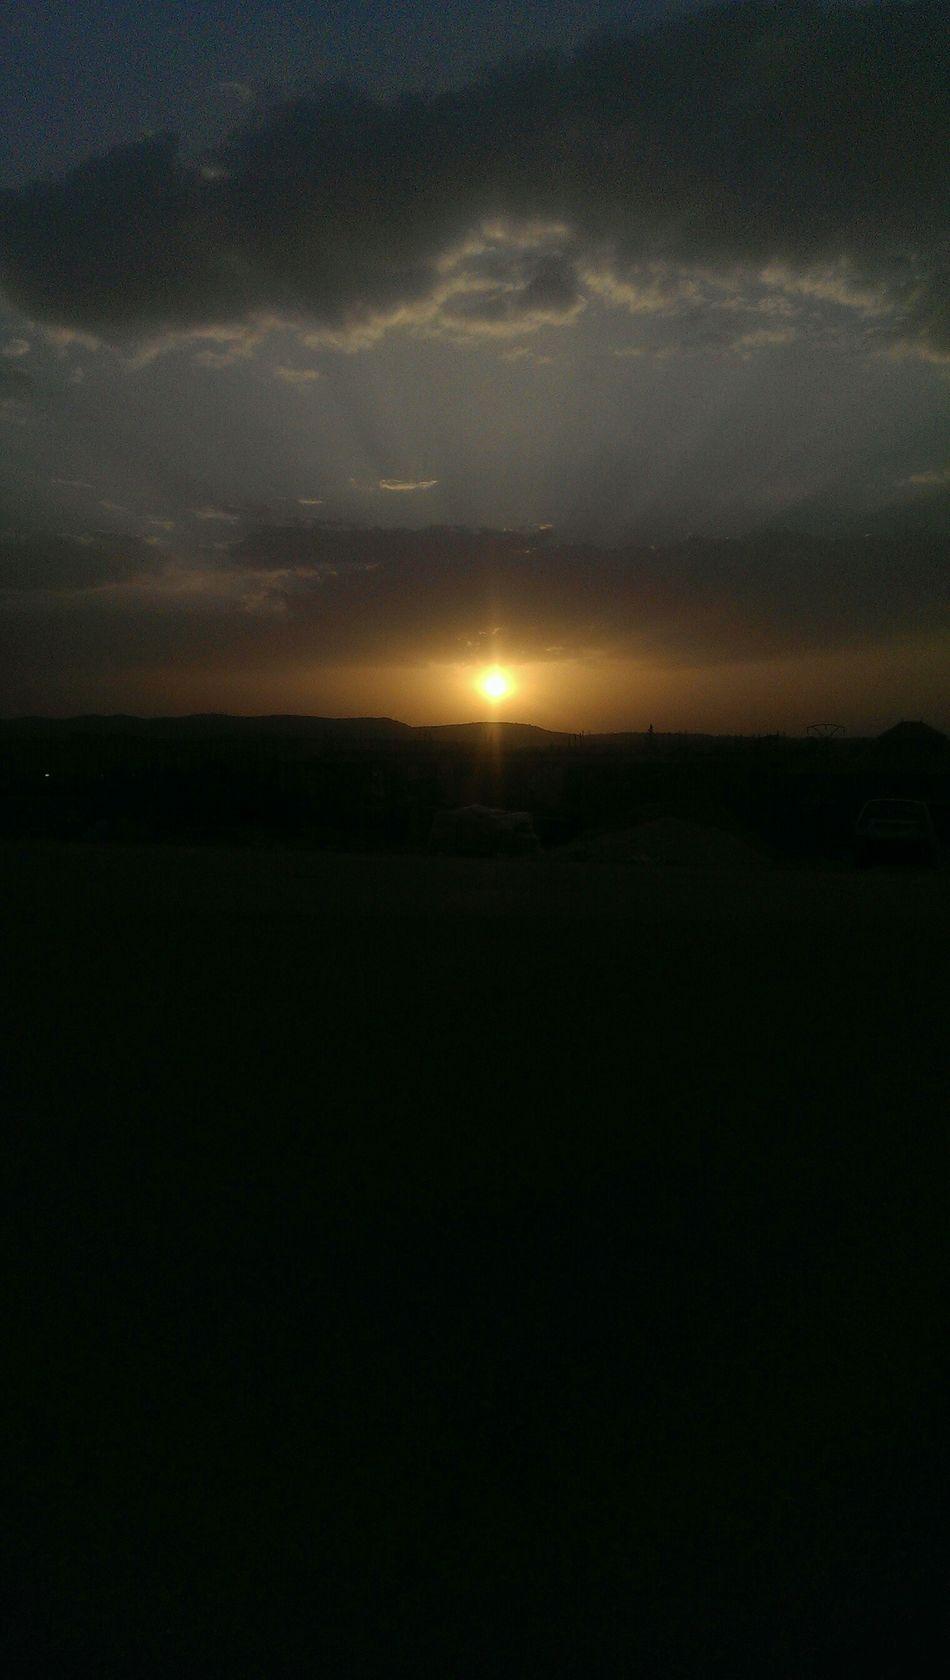 Sunset ♡ ♡ ♡ ♥ ♥ ♥